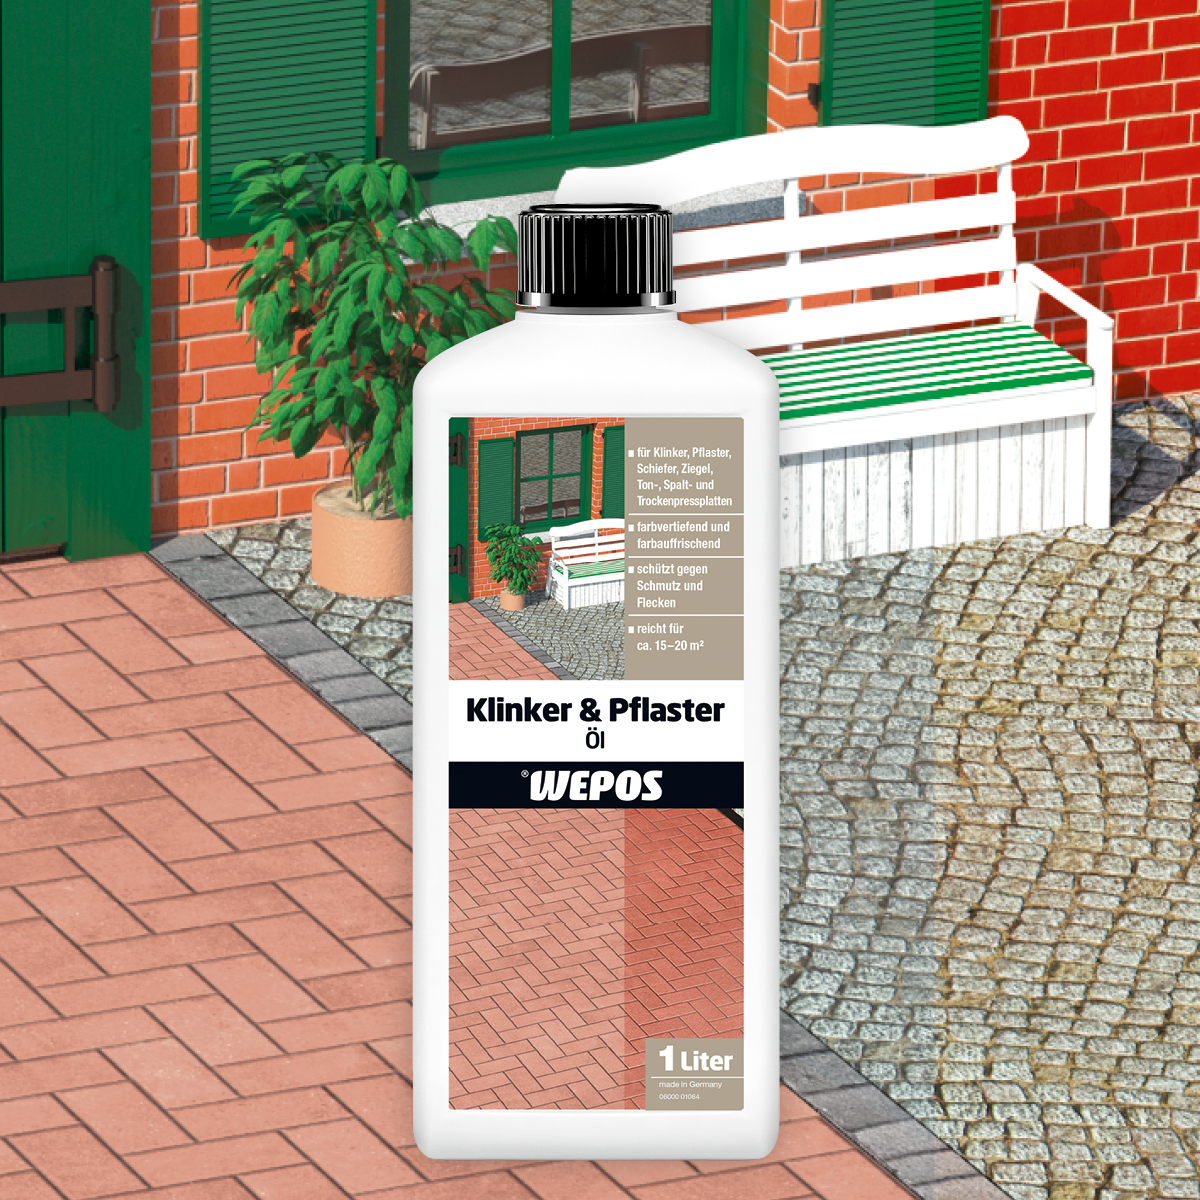 Klinker & Pflaster Öl